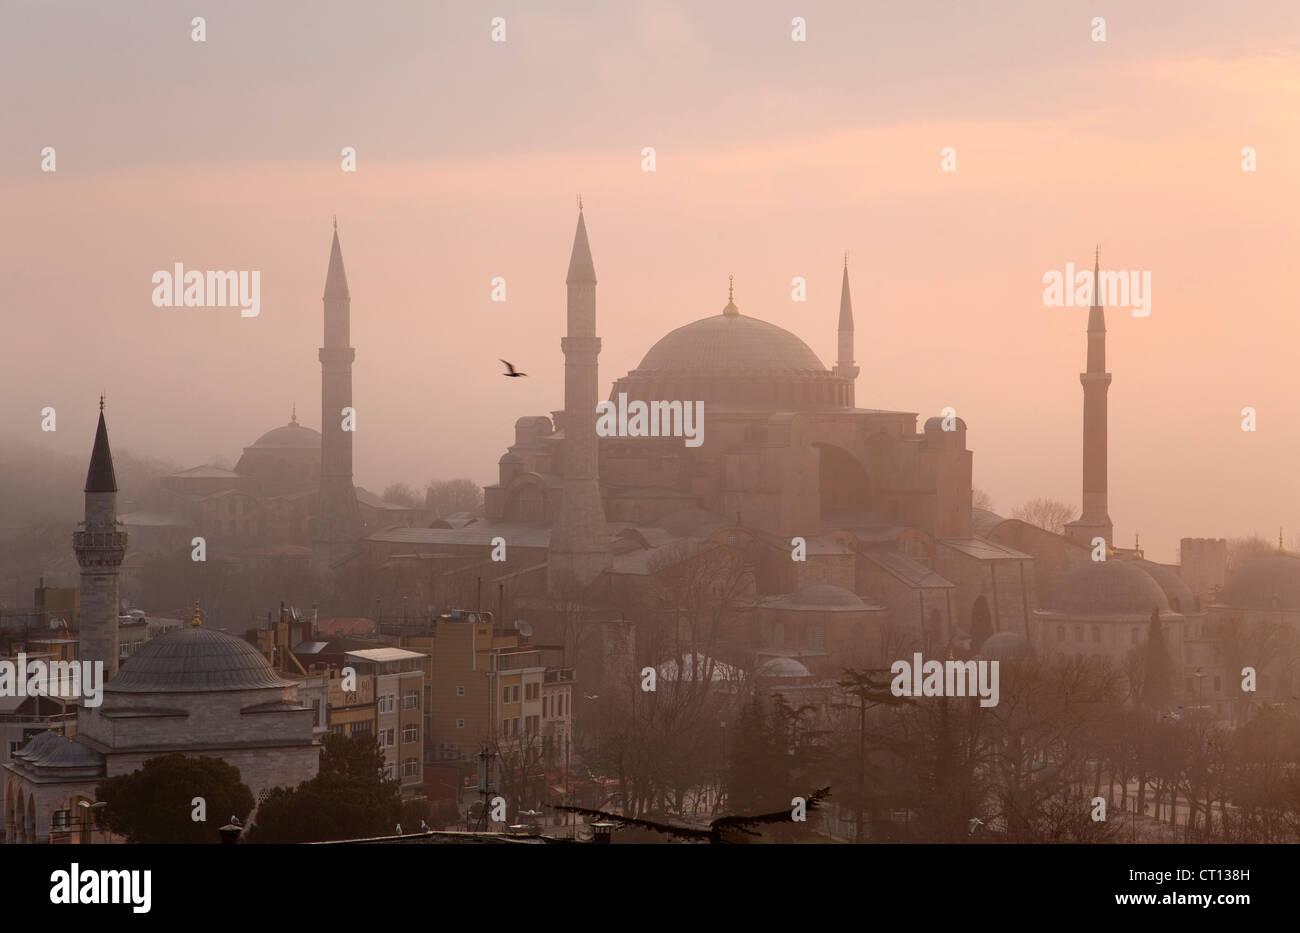 Vista aérea de Estambul al amanecer Imagen De Stock